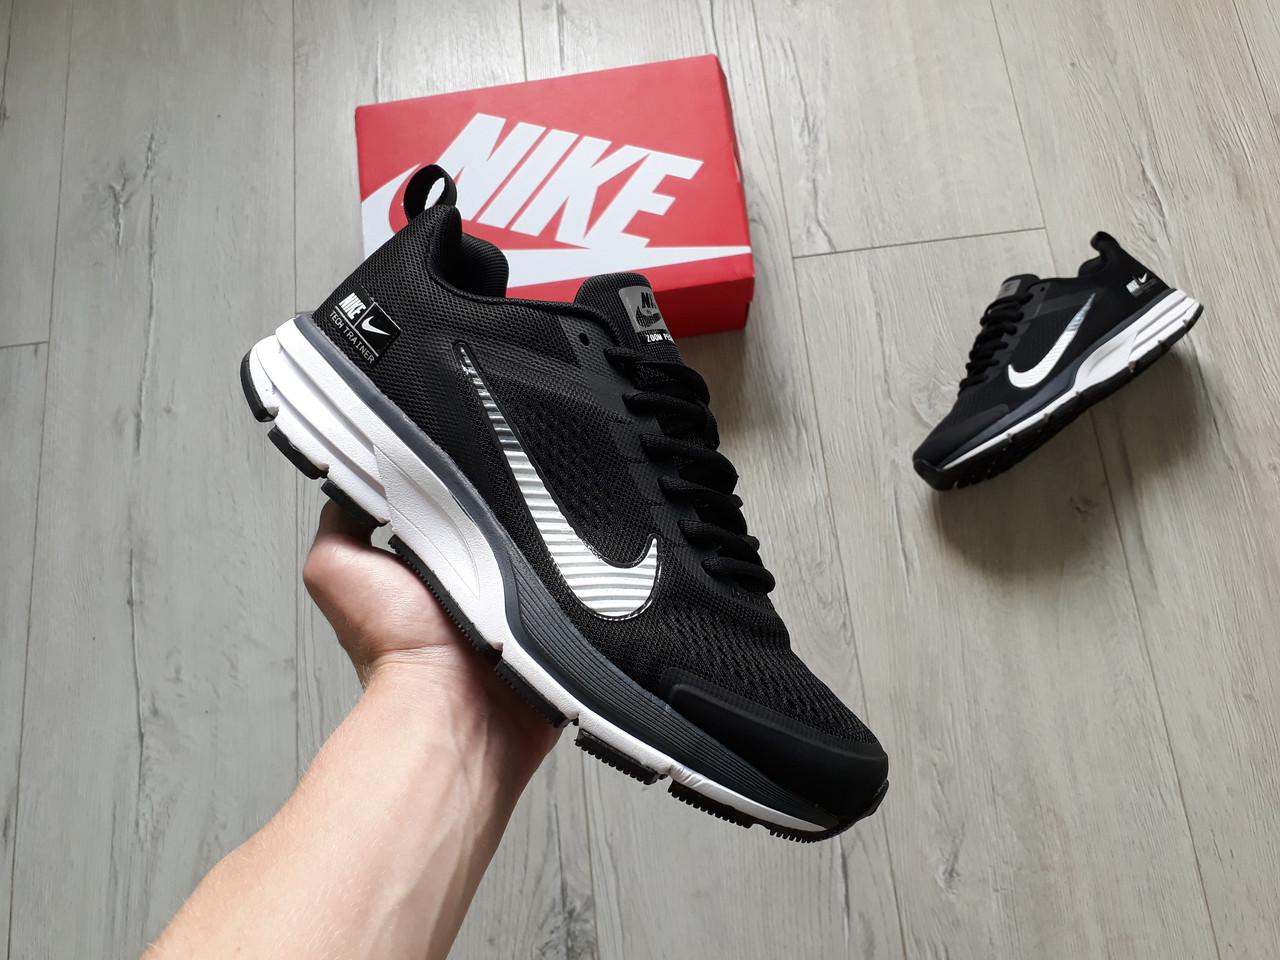 0325ea44 Мужские кроссовки Nike Air Zoom Pegasus 29 Black White черные с белым  эксклюзив 2019 - sinitsa_shop